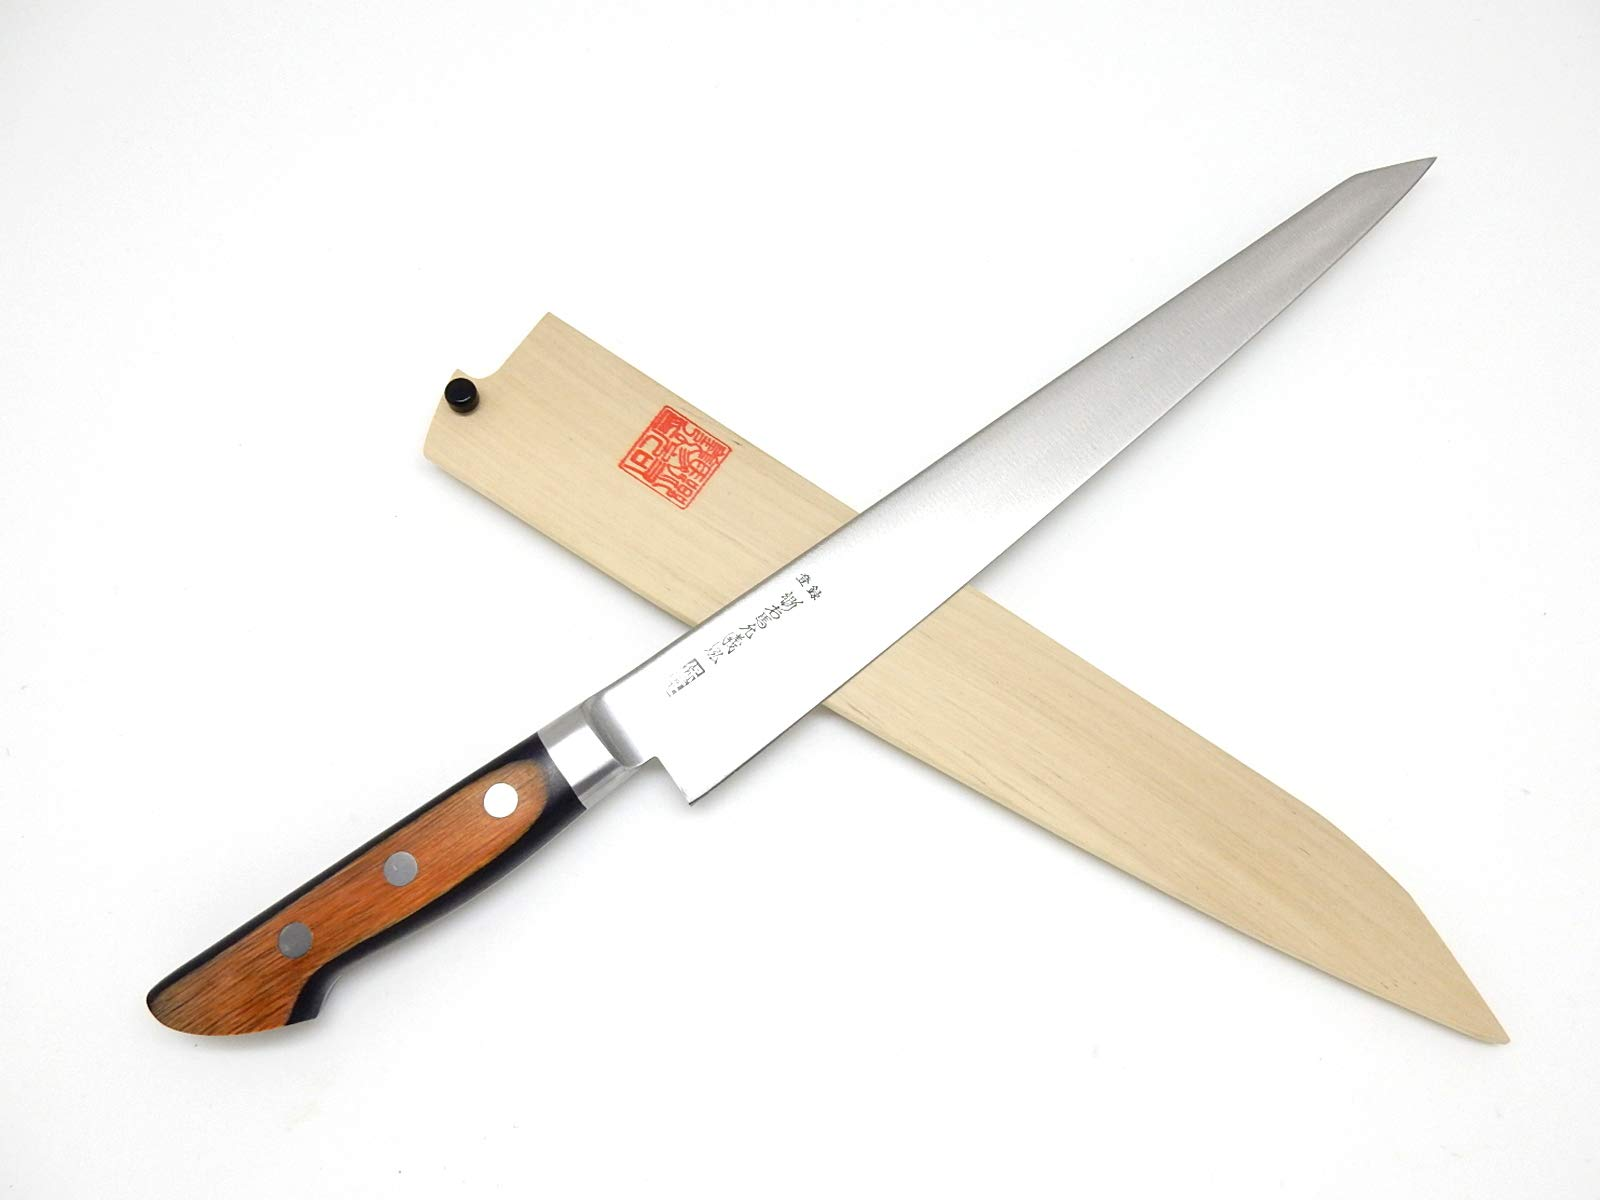 Yoshihiro Hi-Carbon Japan Steel(SK-4), HGB Series Japanese Chef's Sujihiki Slicer, with Wooden Saya Cover & Saya Pin (270mm/10.6'')